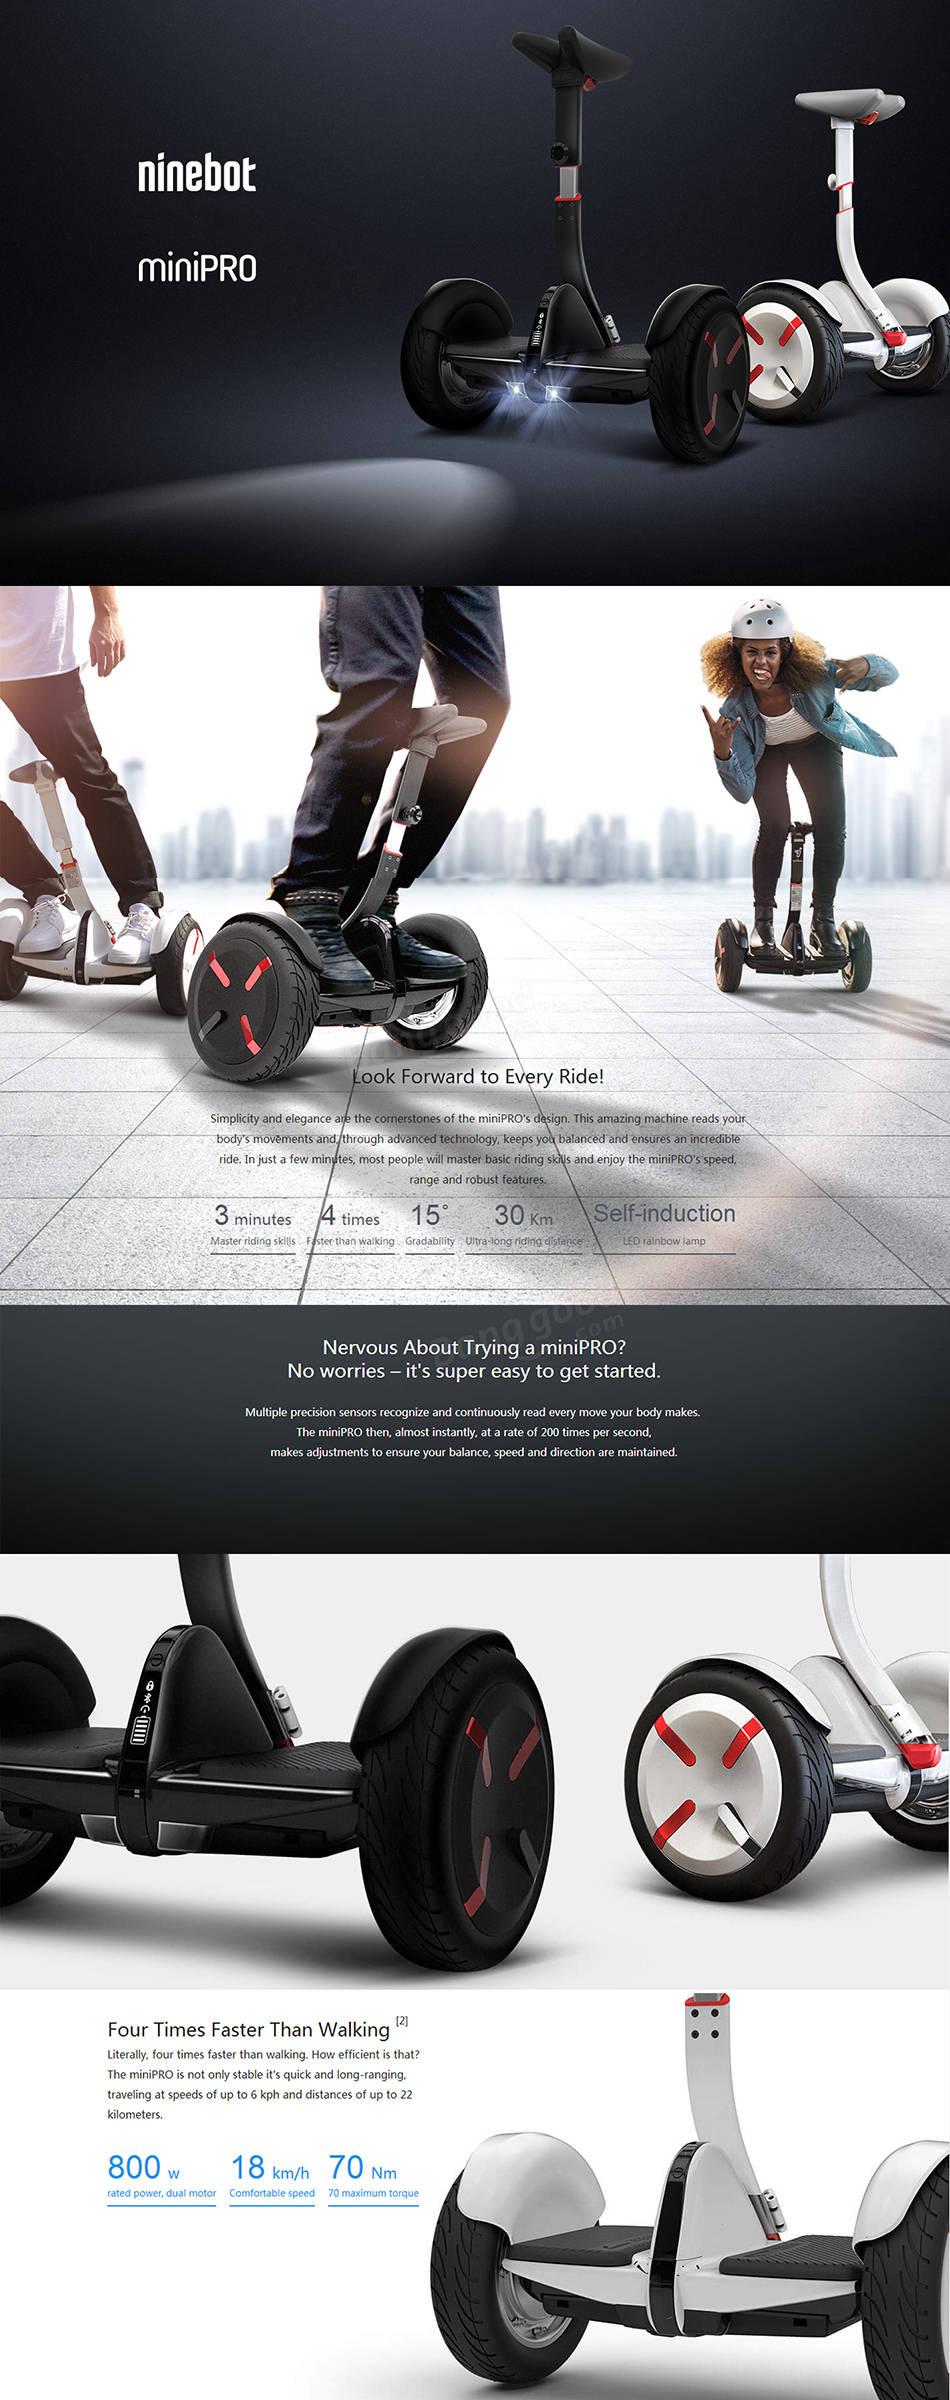 Ninebot Segway Mini Pro N3M320 International Version Smart Self Balancing Scooter with 400W x 2 18km/h Max. Speed